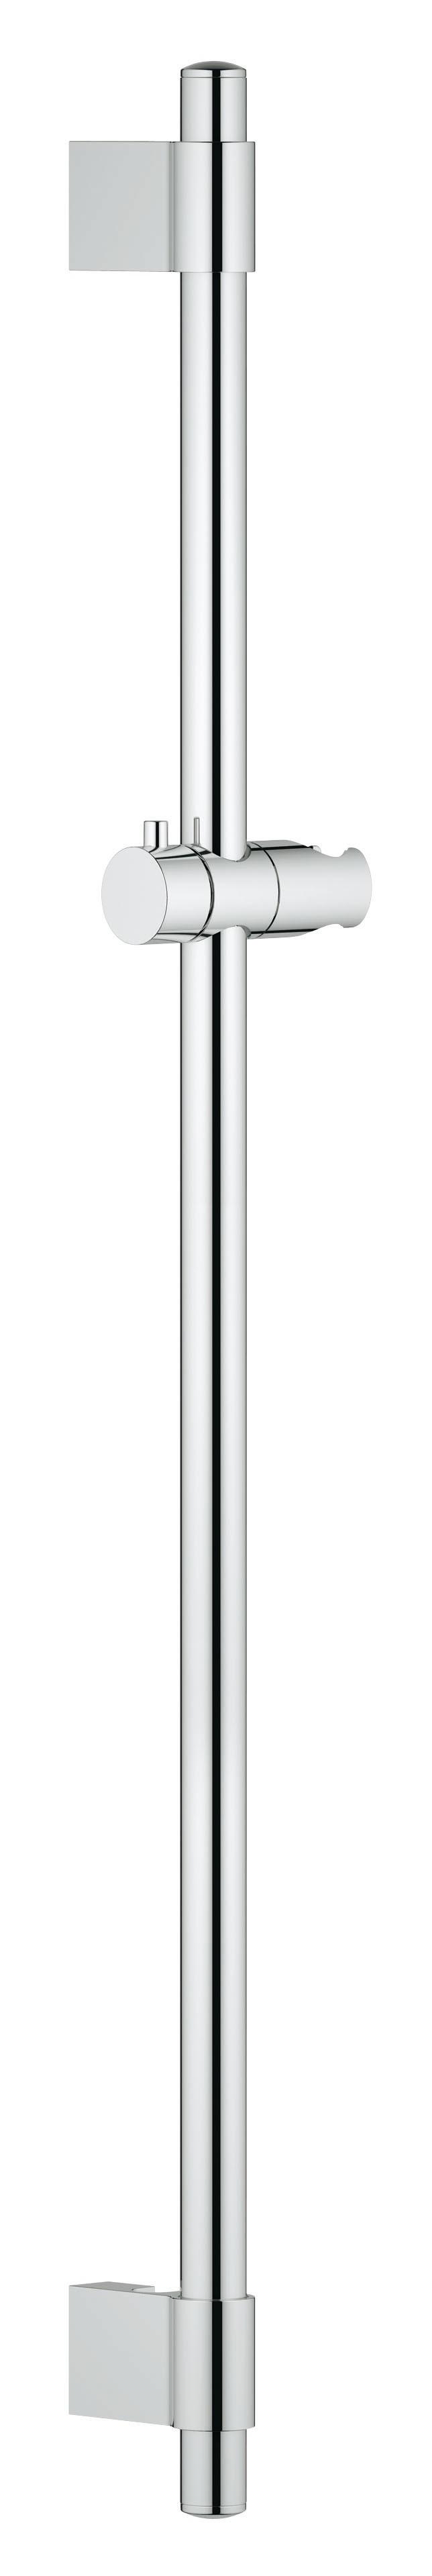 Душевой кронштейн Grohe 27785000 Power&Soul 900 мм, хром